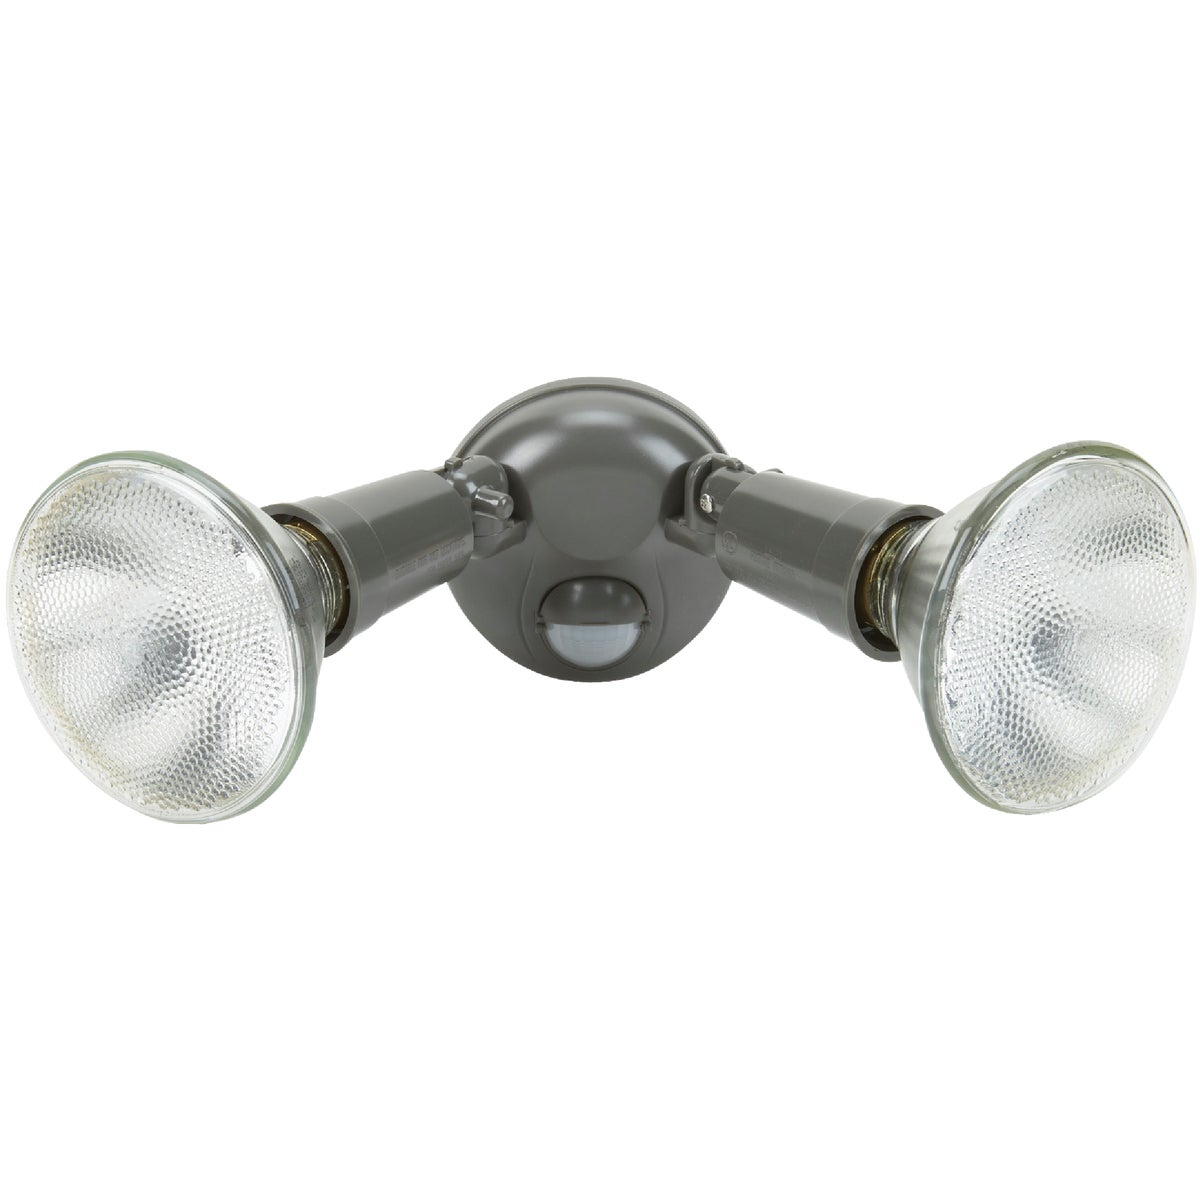 110-Degree Incandescent Motion Floodlight Fixture